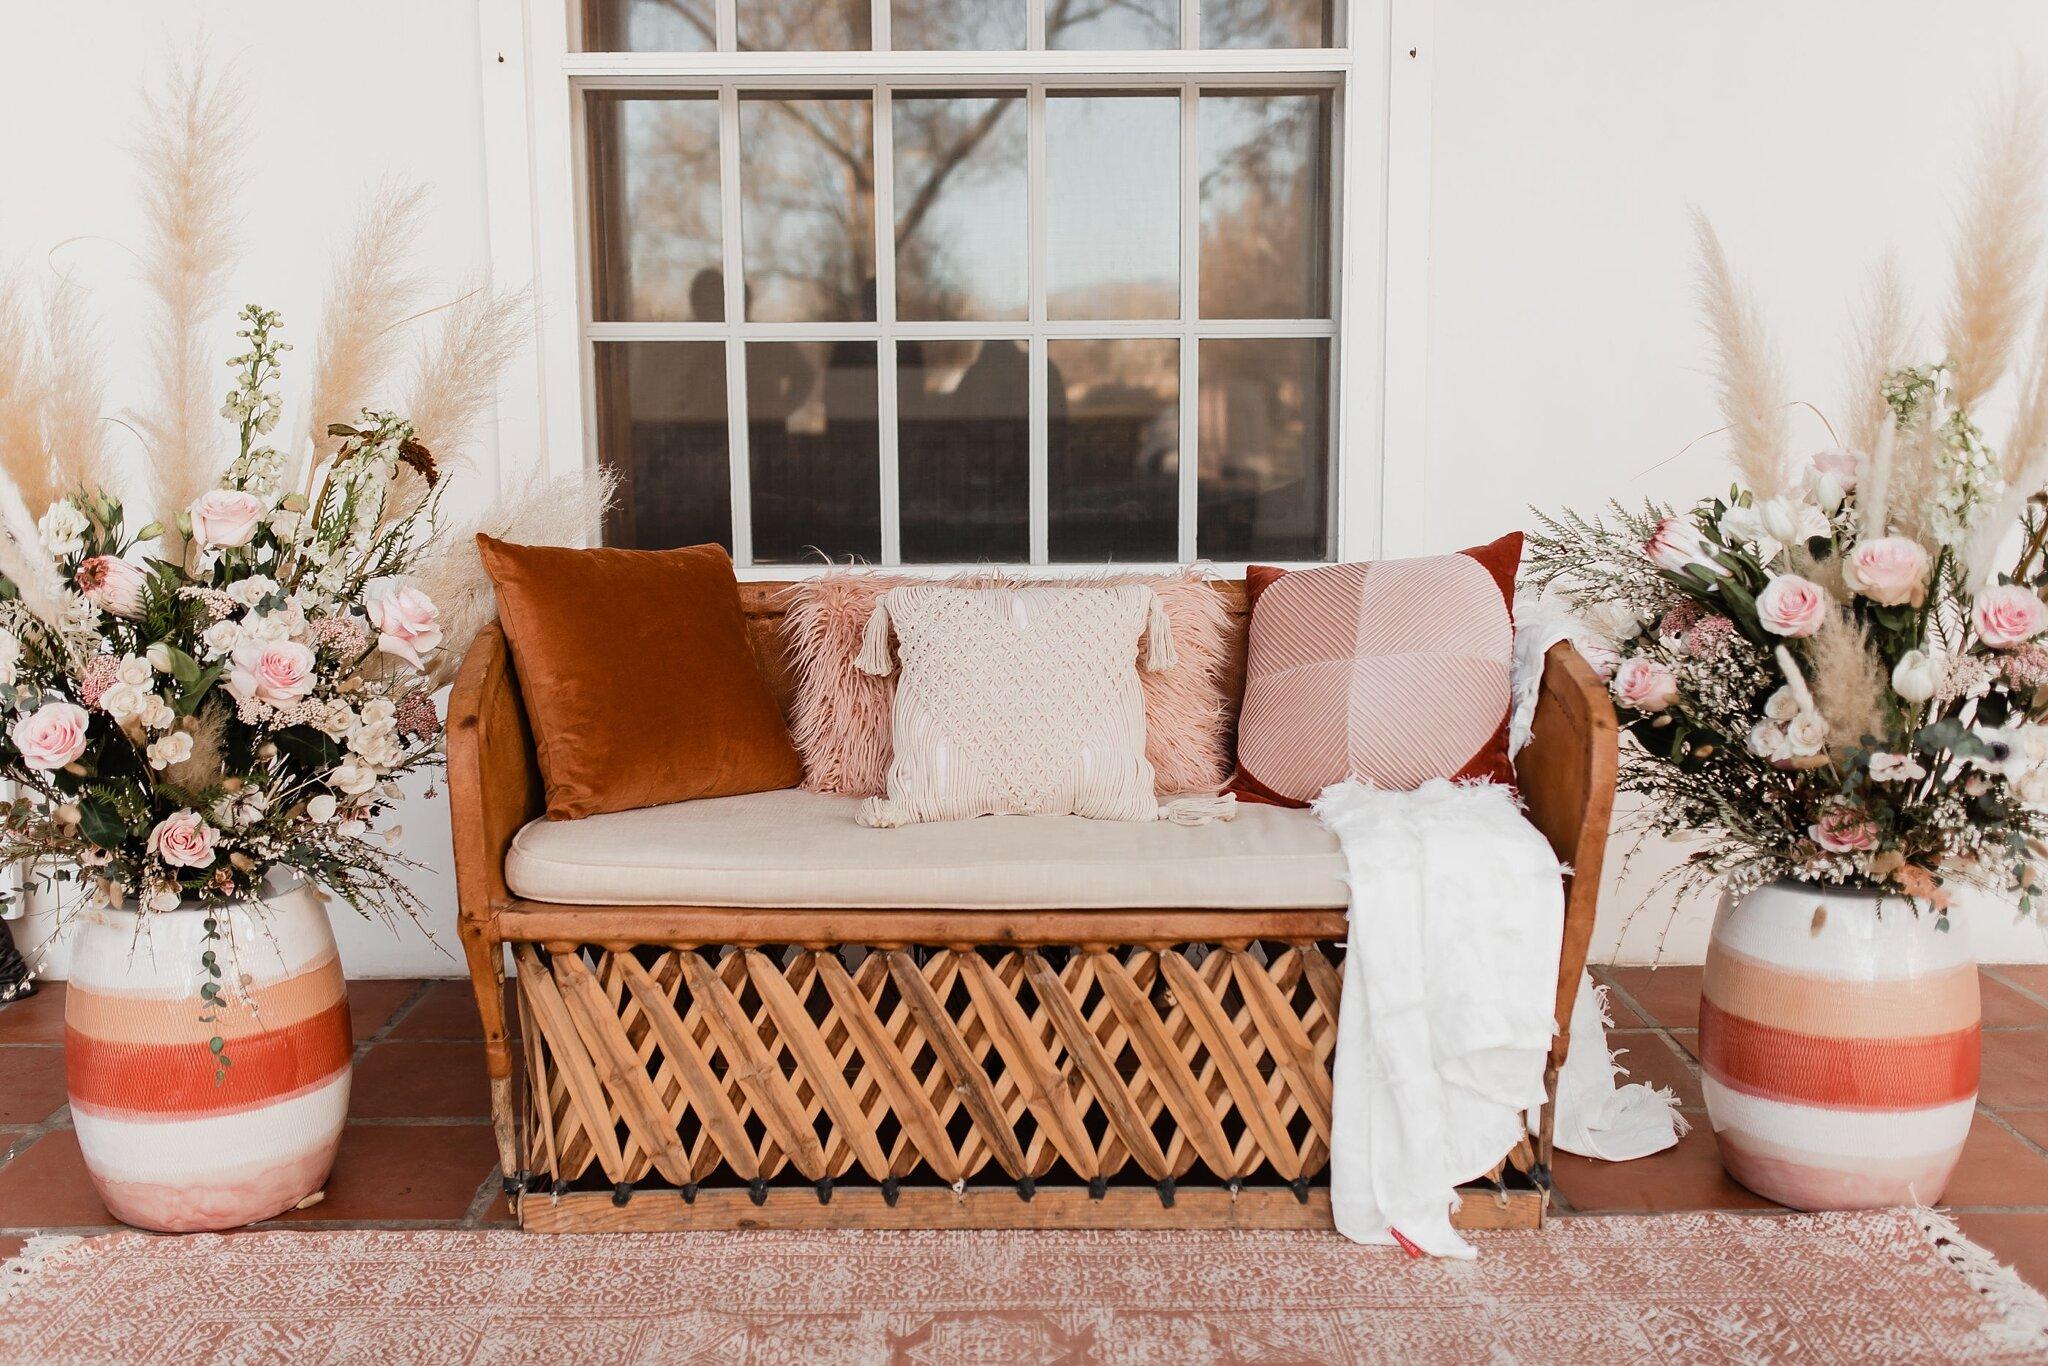 Alicia+lucia+photography+-+albuquerque+wedding+photographer+-+santa+fe+wedding+photography+-+new+mexico+wedding+photographer+-+new+mexico+wedding+-+southwest+wedding+-+destination+wedding+-+wedding+florals+-+pampas+grass+-+desert+wedding_0045.jpg